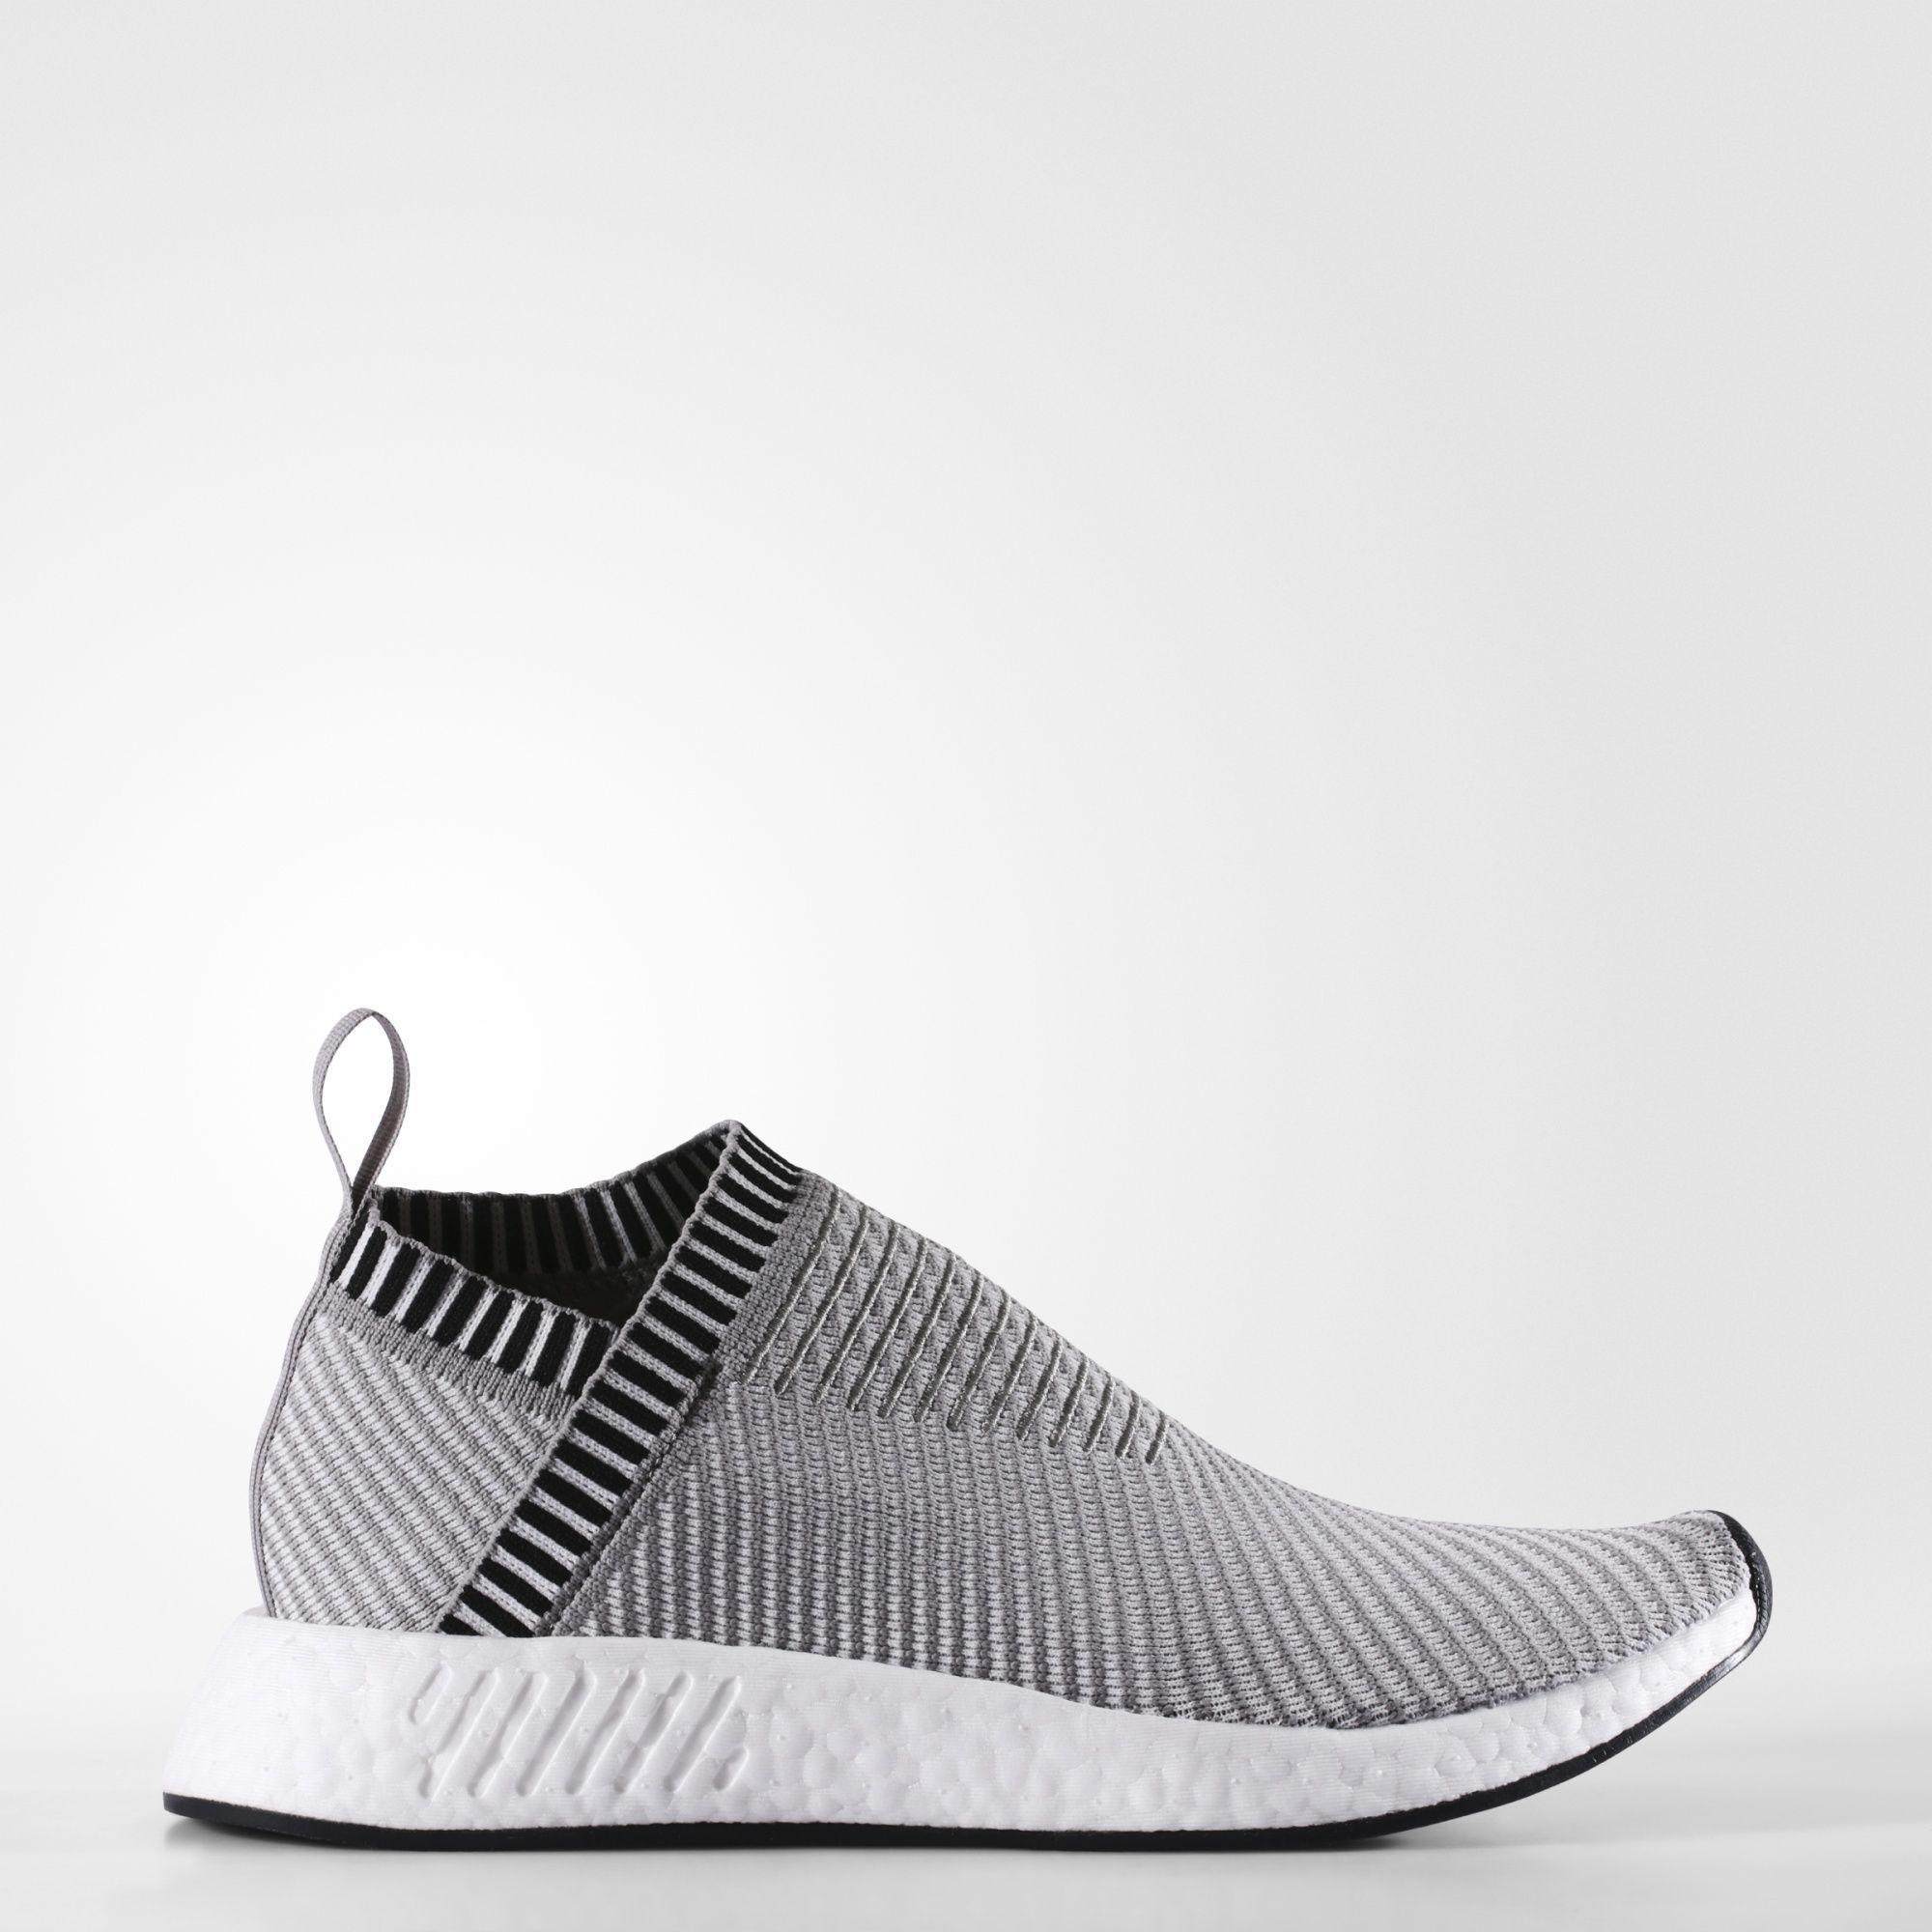 2dbf1b1d1 Adidas NMD CS2 Primeknit Shoes Dark Grey Heather Solid Grey Footwear White  Shock Pink BA7187